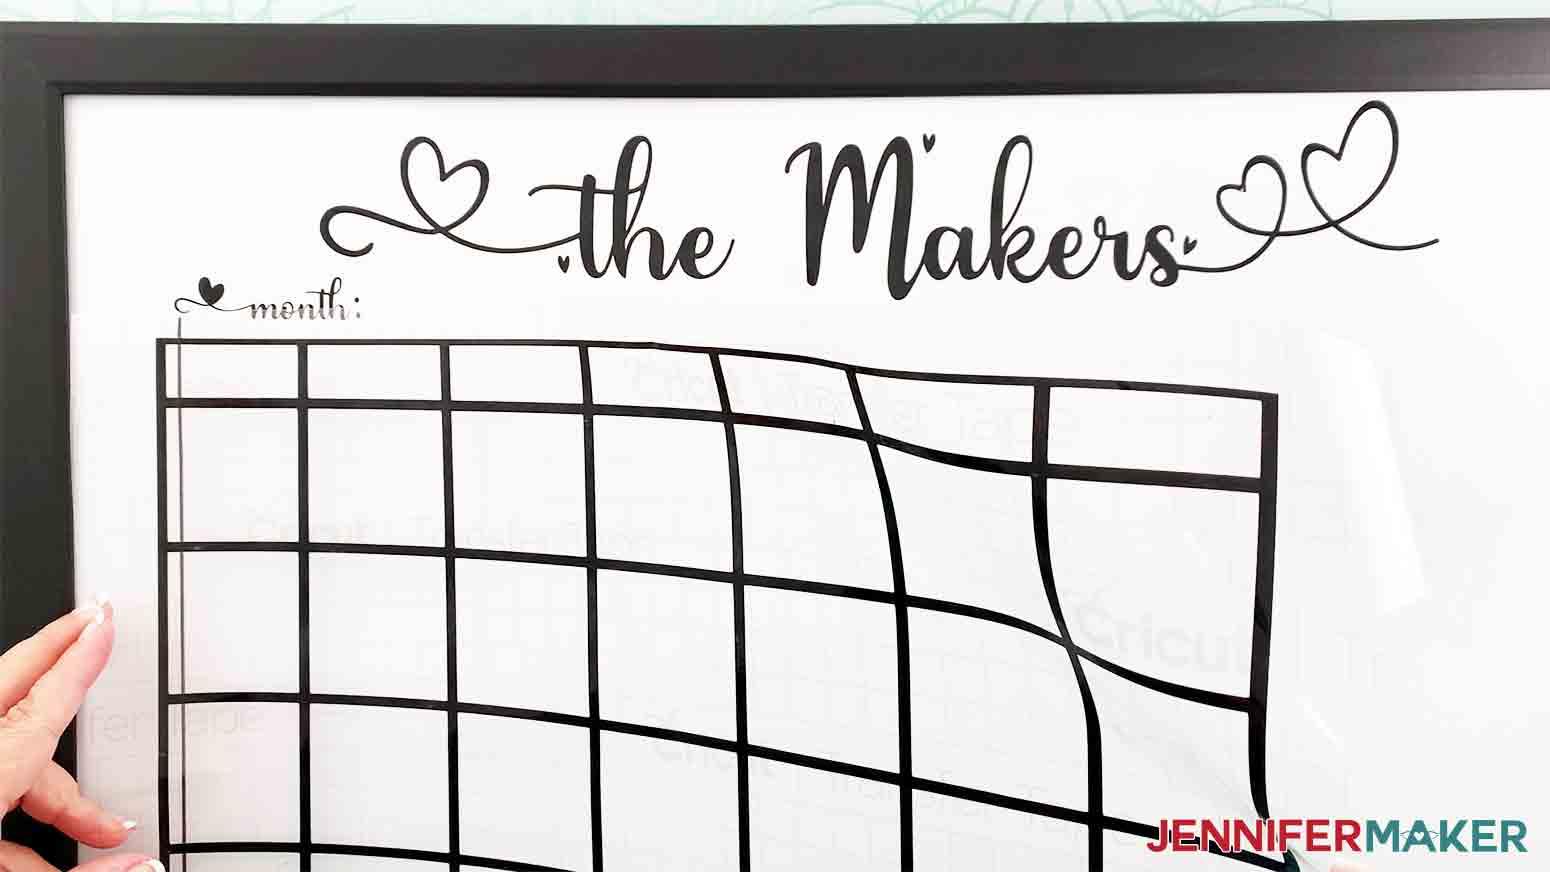 DIY-Whiteboard-Calendar-JenniferMaker-align-and-apply-calendar